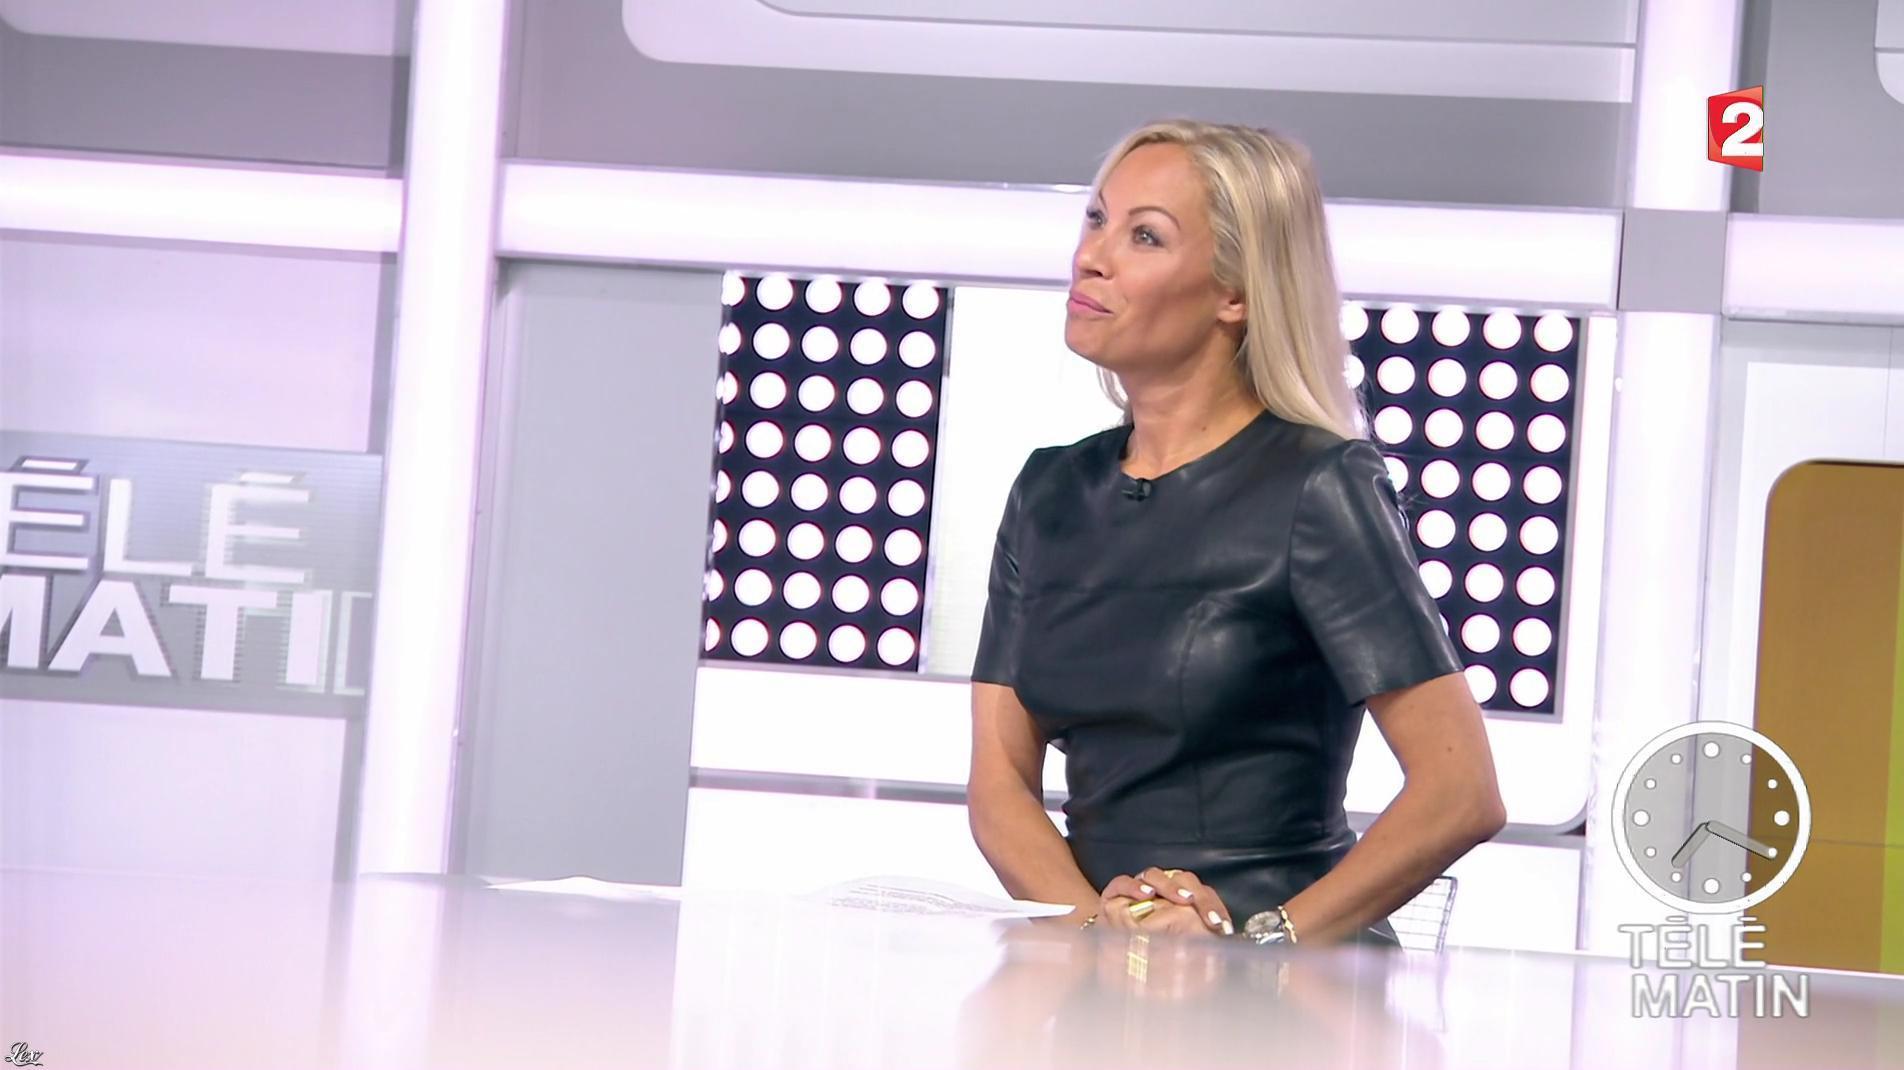 Charlotte Bouteloup Telematin Carine Galli Europa League